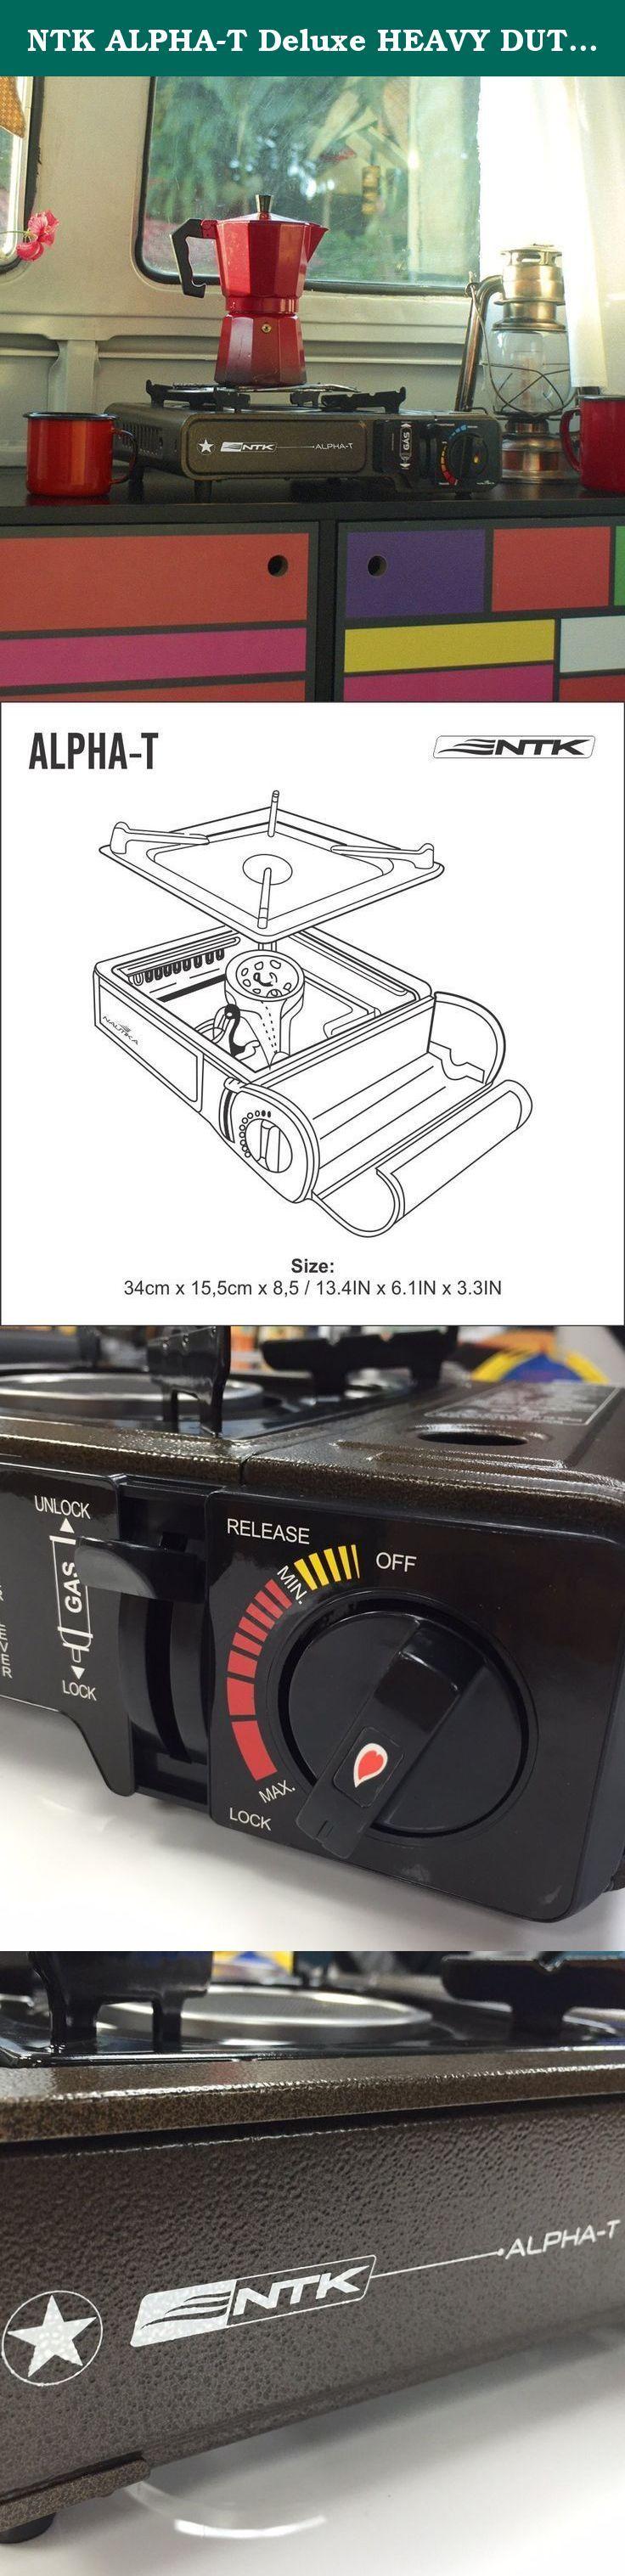 Wiring Diagram Stove Plug